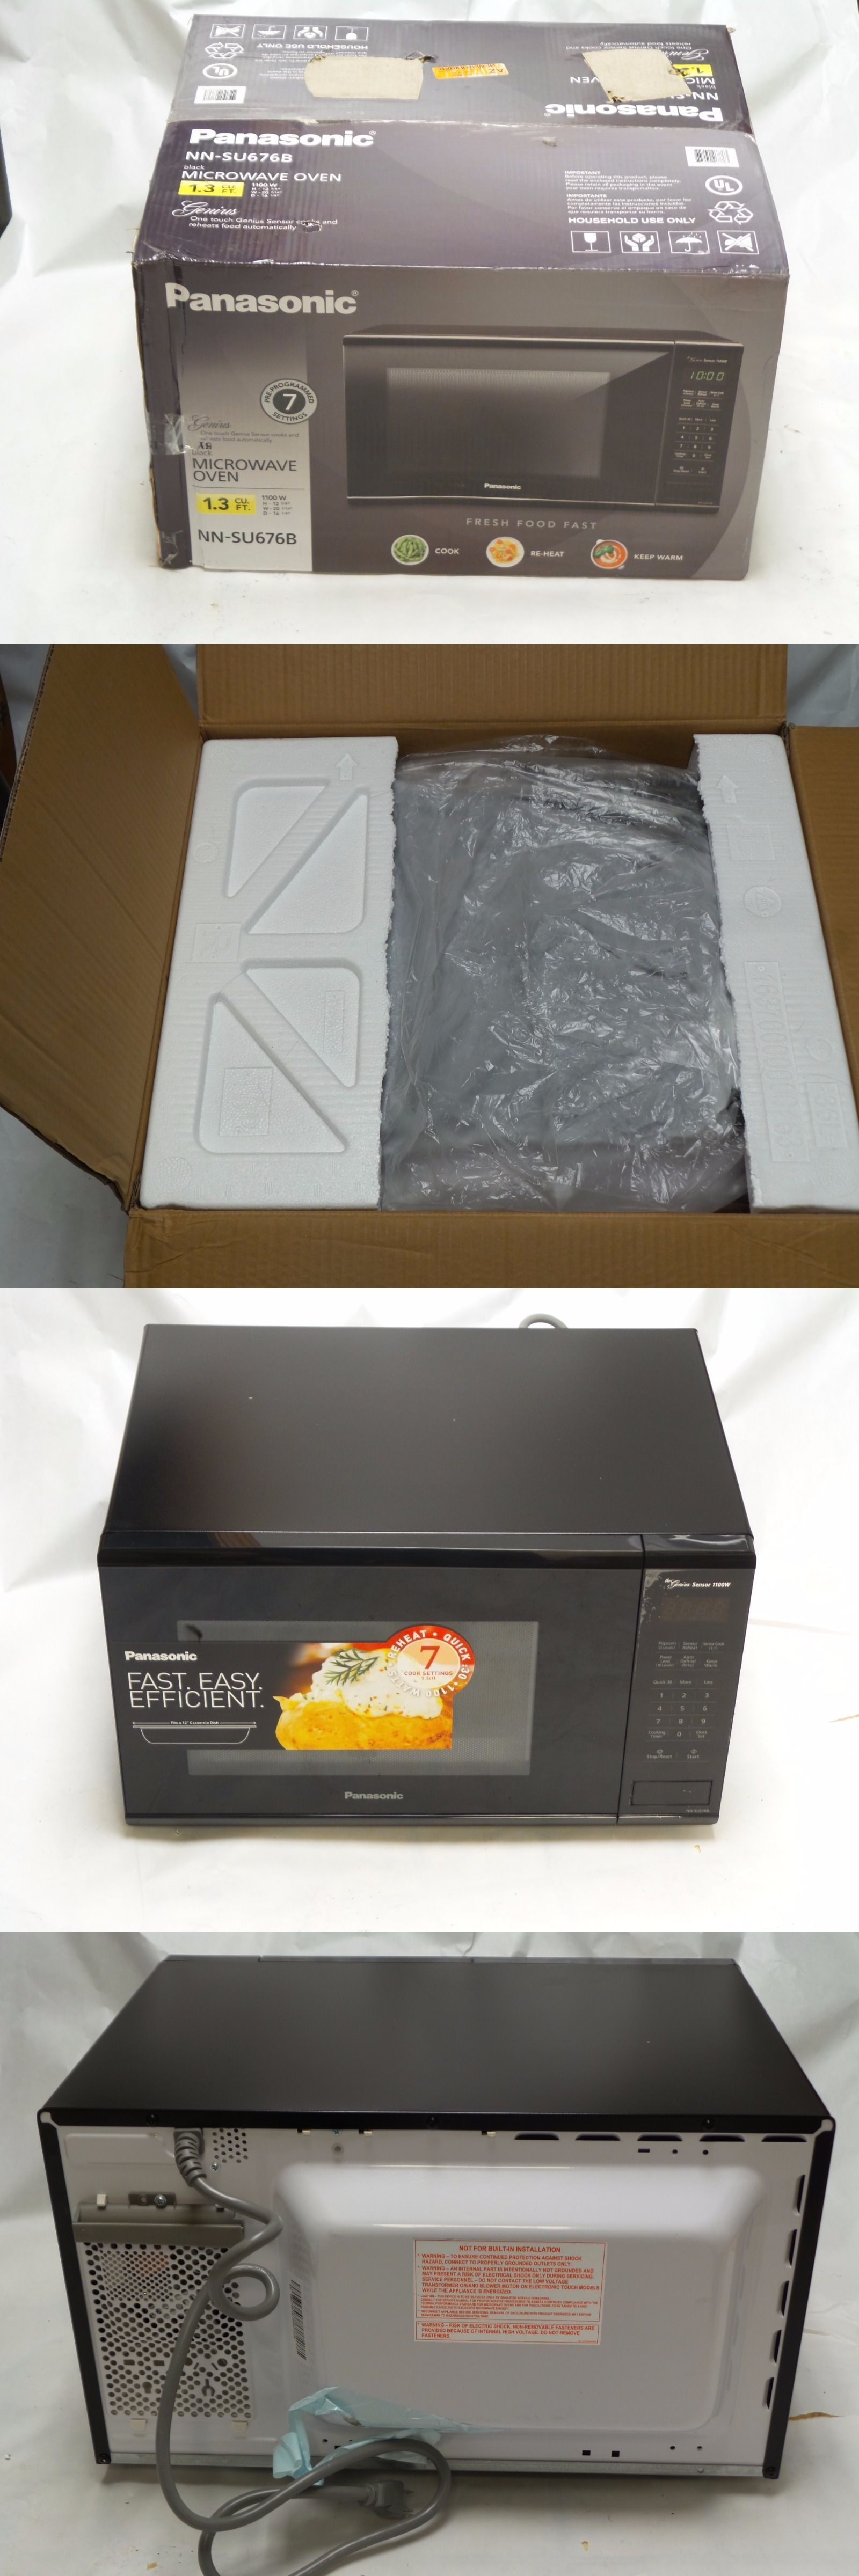 Microwave Ovens 150140 Panasonic Nn Su676b 1 3 Cu Ft Mid Size 1100 Watts Black Microwave Buy Countertop Microwave Oven Oven Models Countertop Microwave